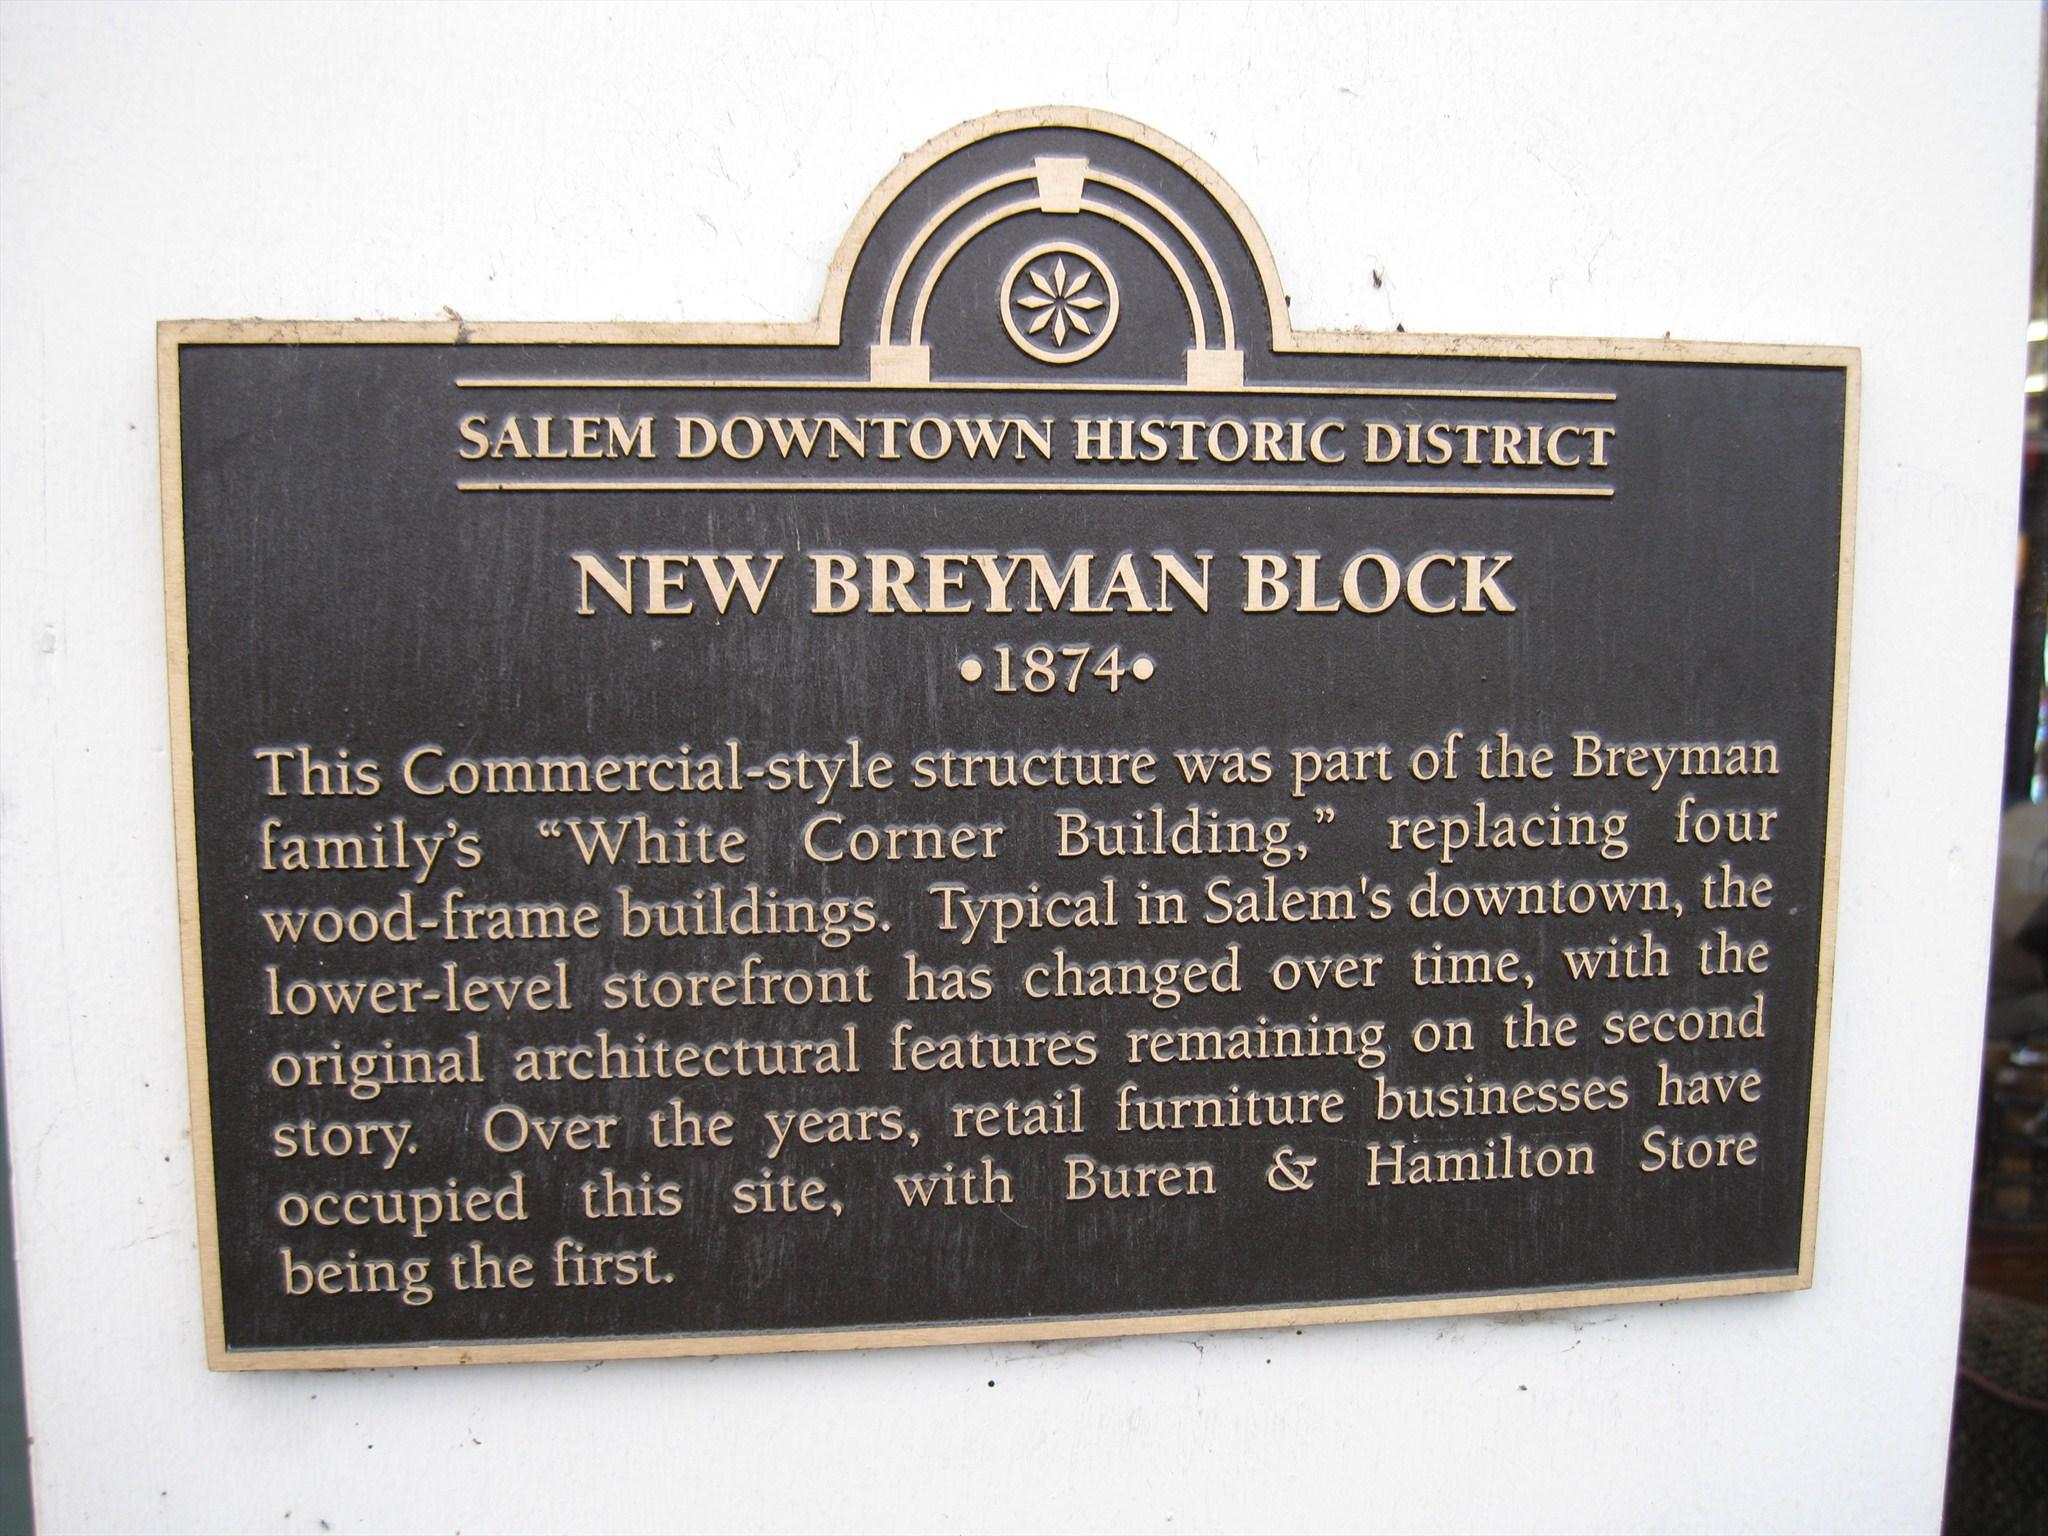 New Breyman Block Salem Downtown Historic District